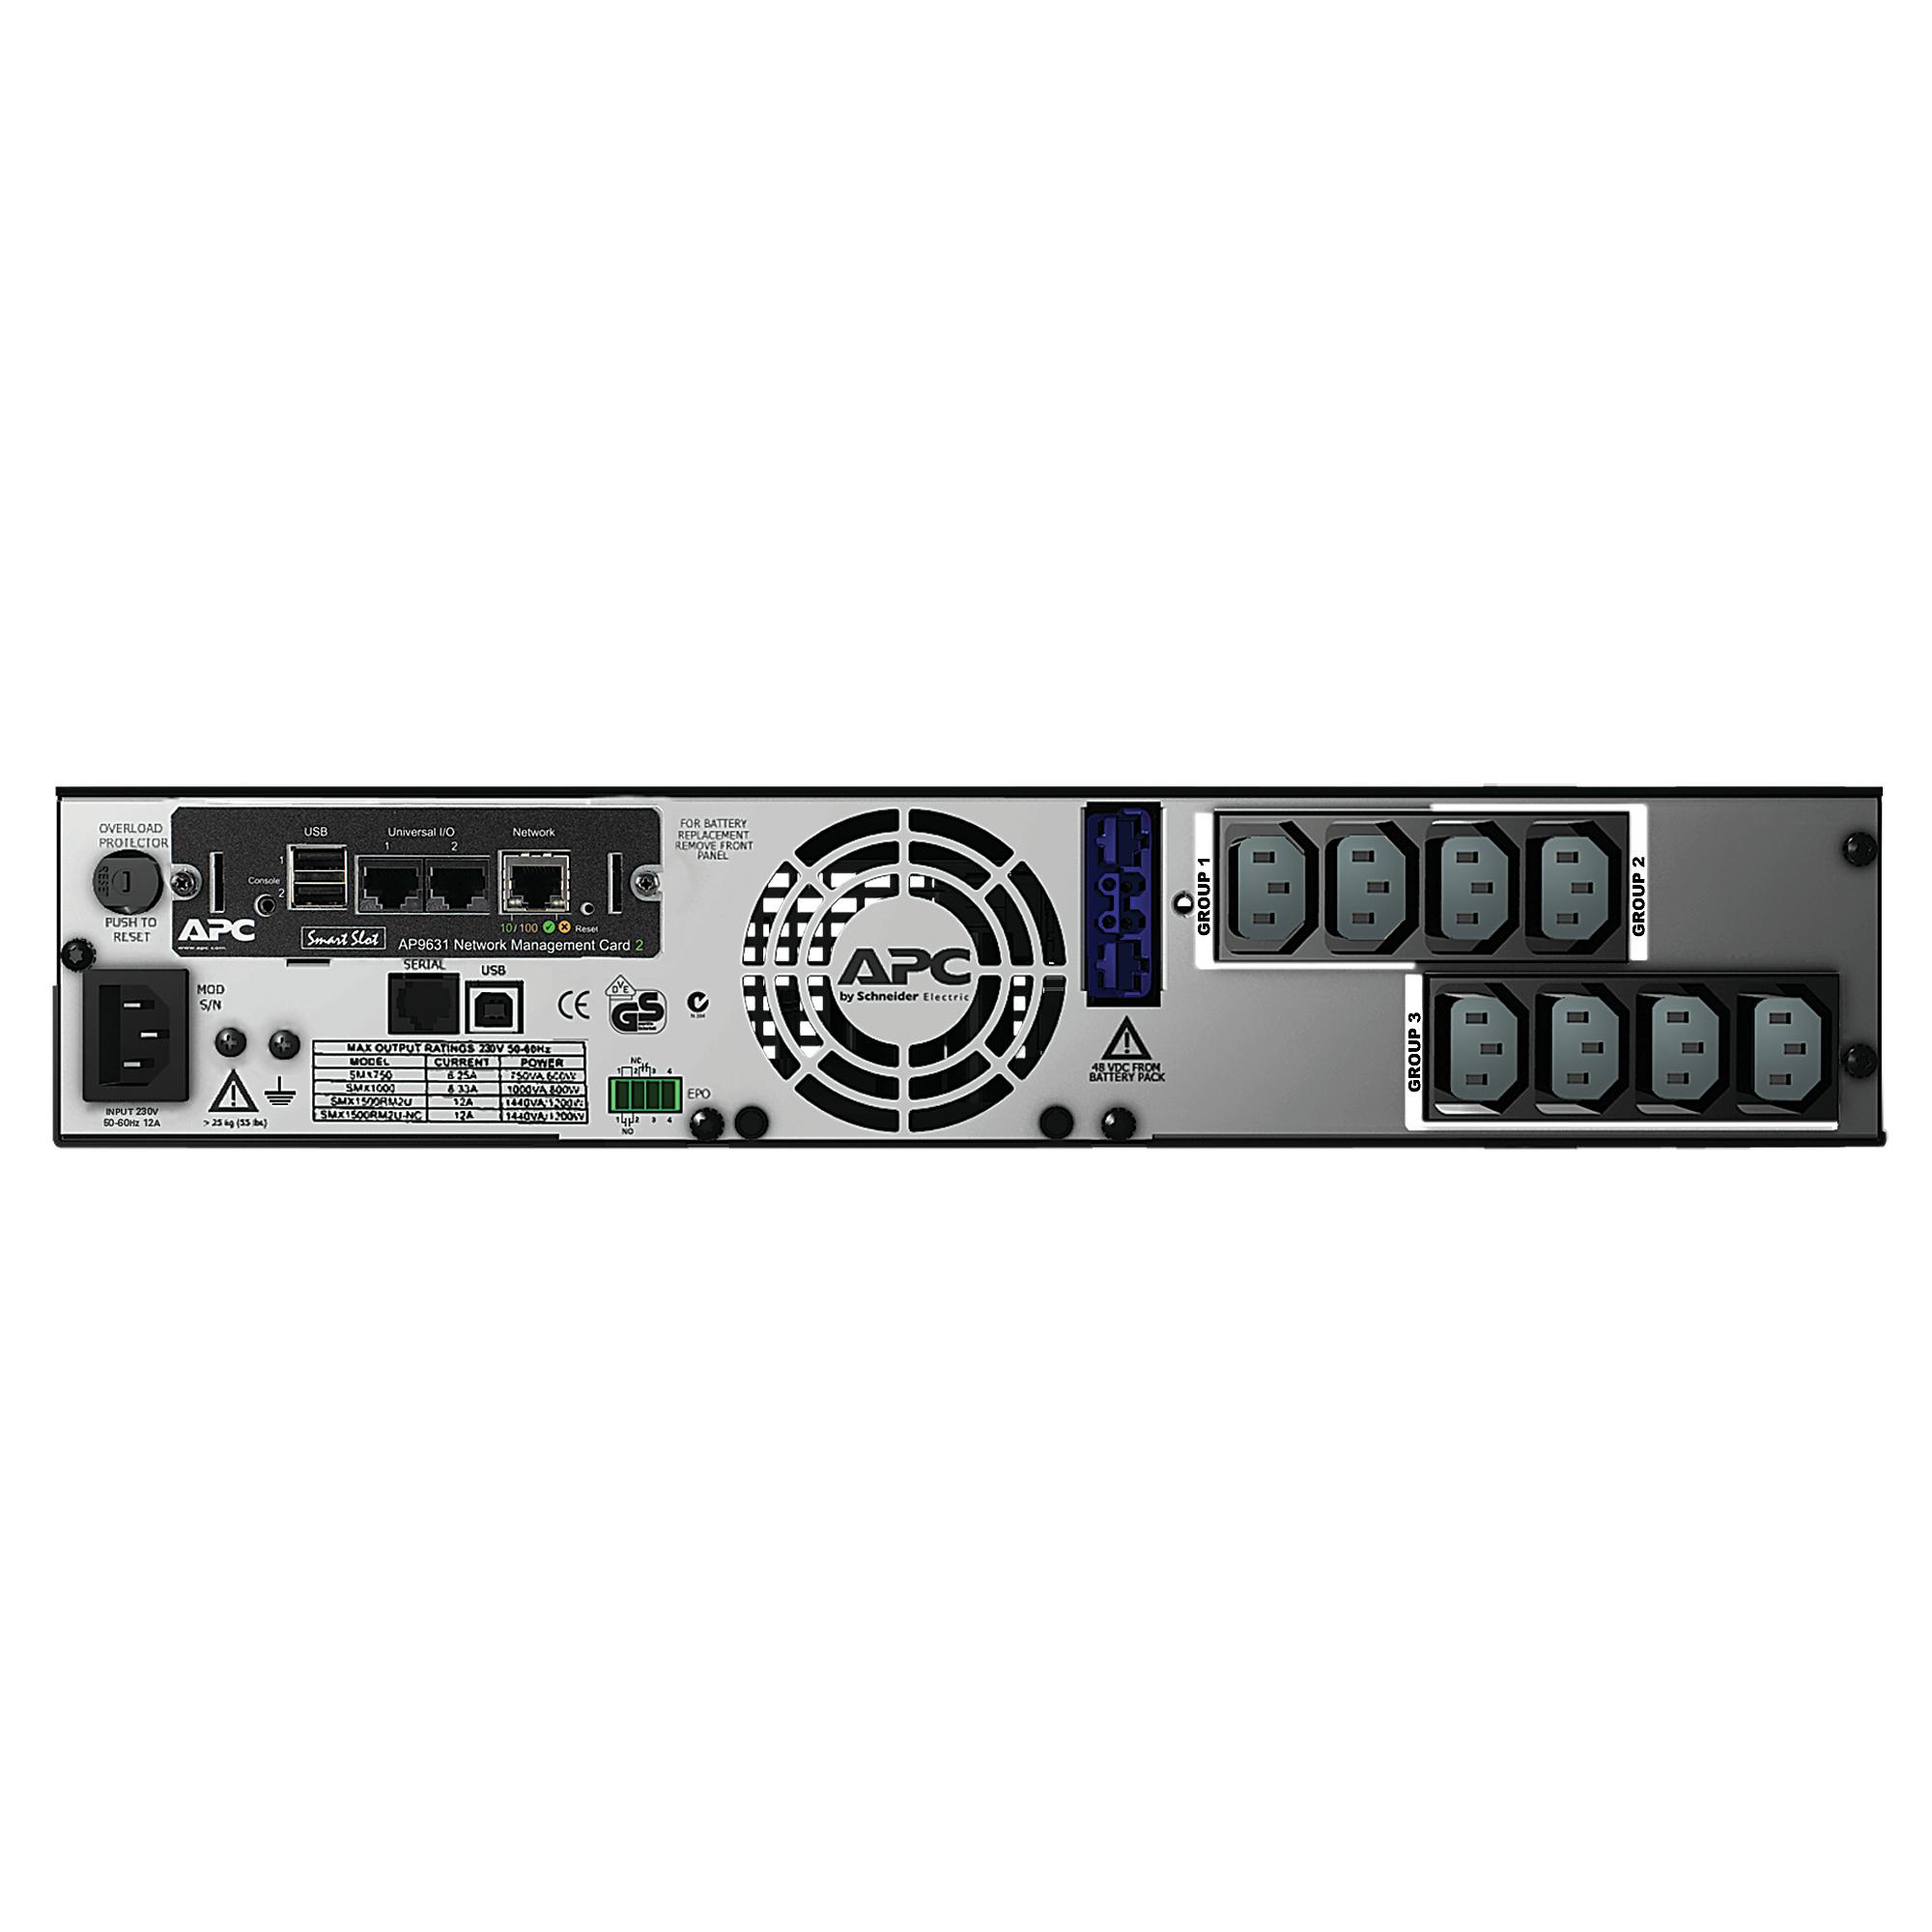 SMX1500RMI2UNC Smart-UPS X (1500 VA, Rack/Tower, LCD, rack-mountable, 1200 Watt, 1500 VA, Ethernet, RS-232, USB, 8 output connectors, 2U)